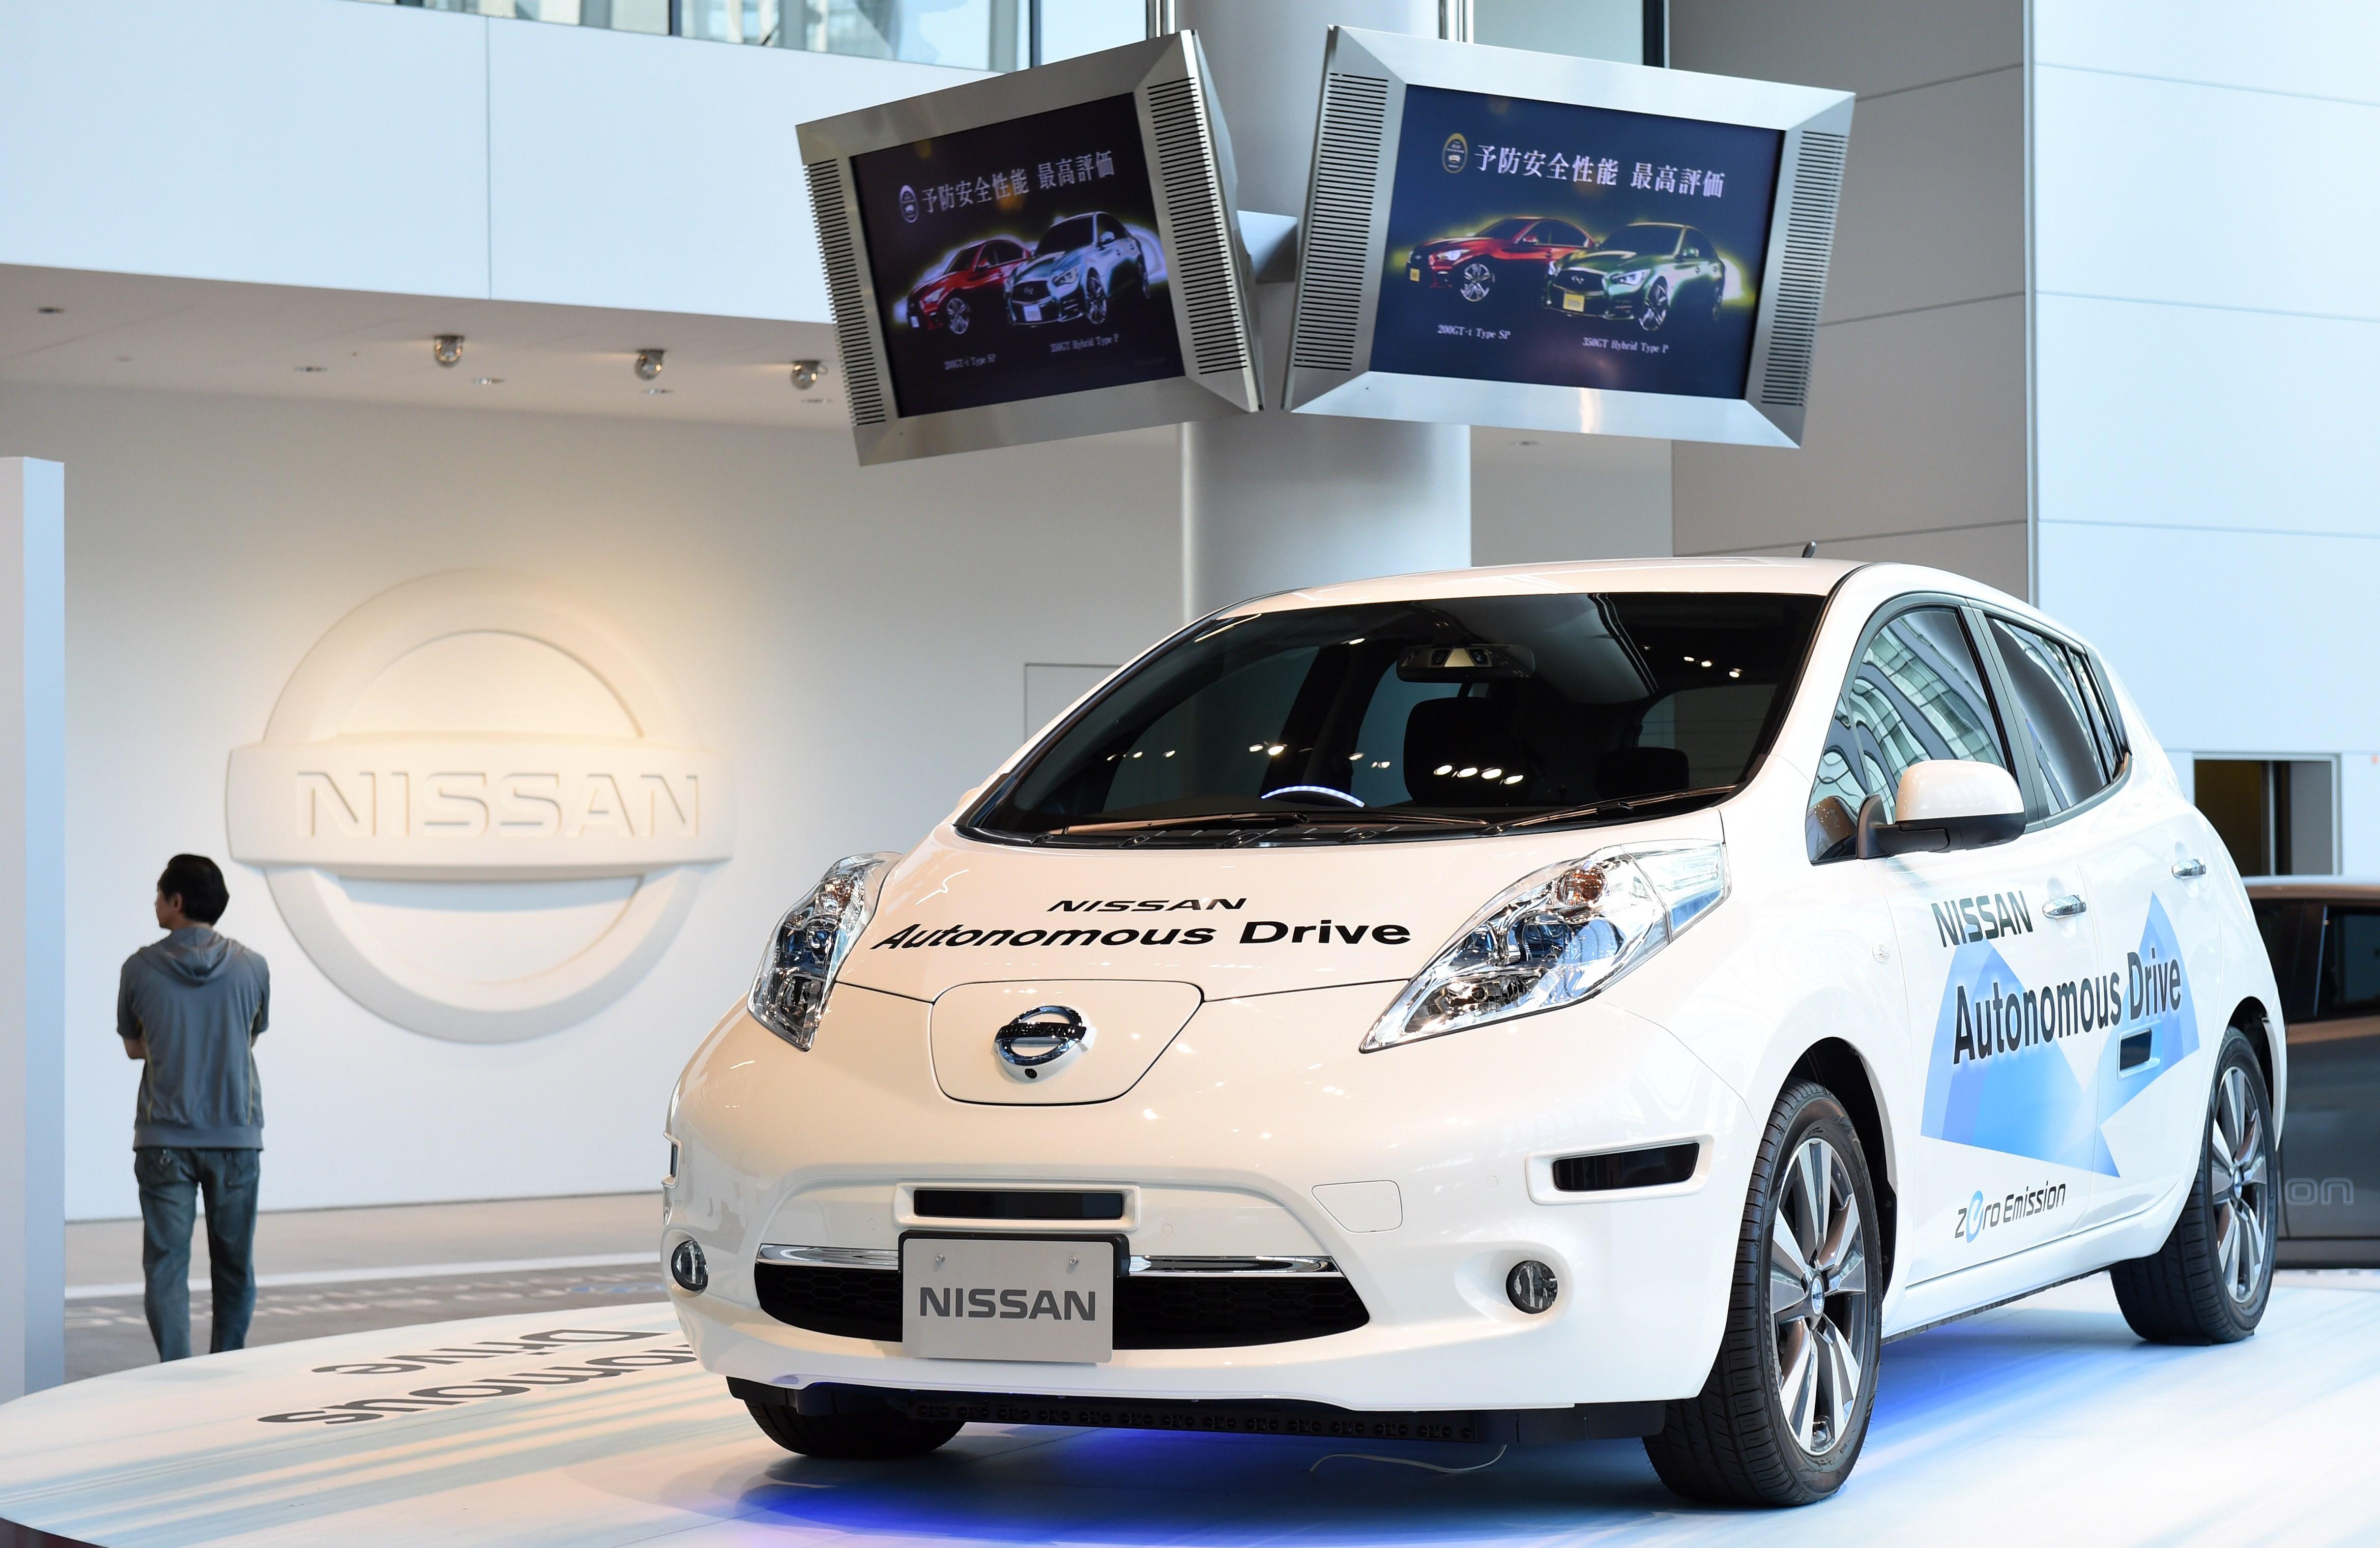 x josh volt electric nissan new tesla car chevrolet for model chevy leaf naias goldman vehicles trimmed